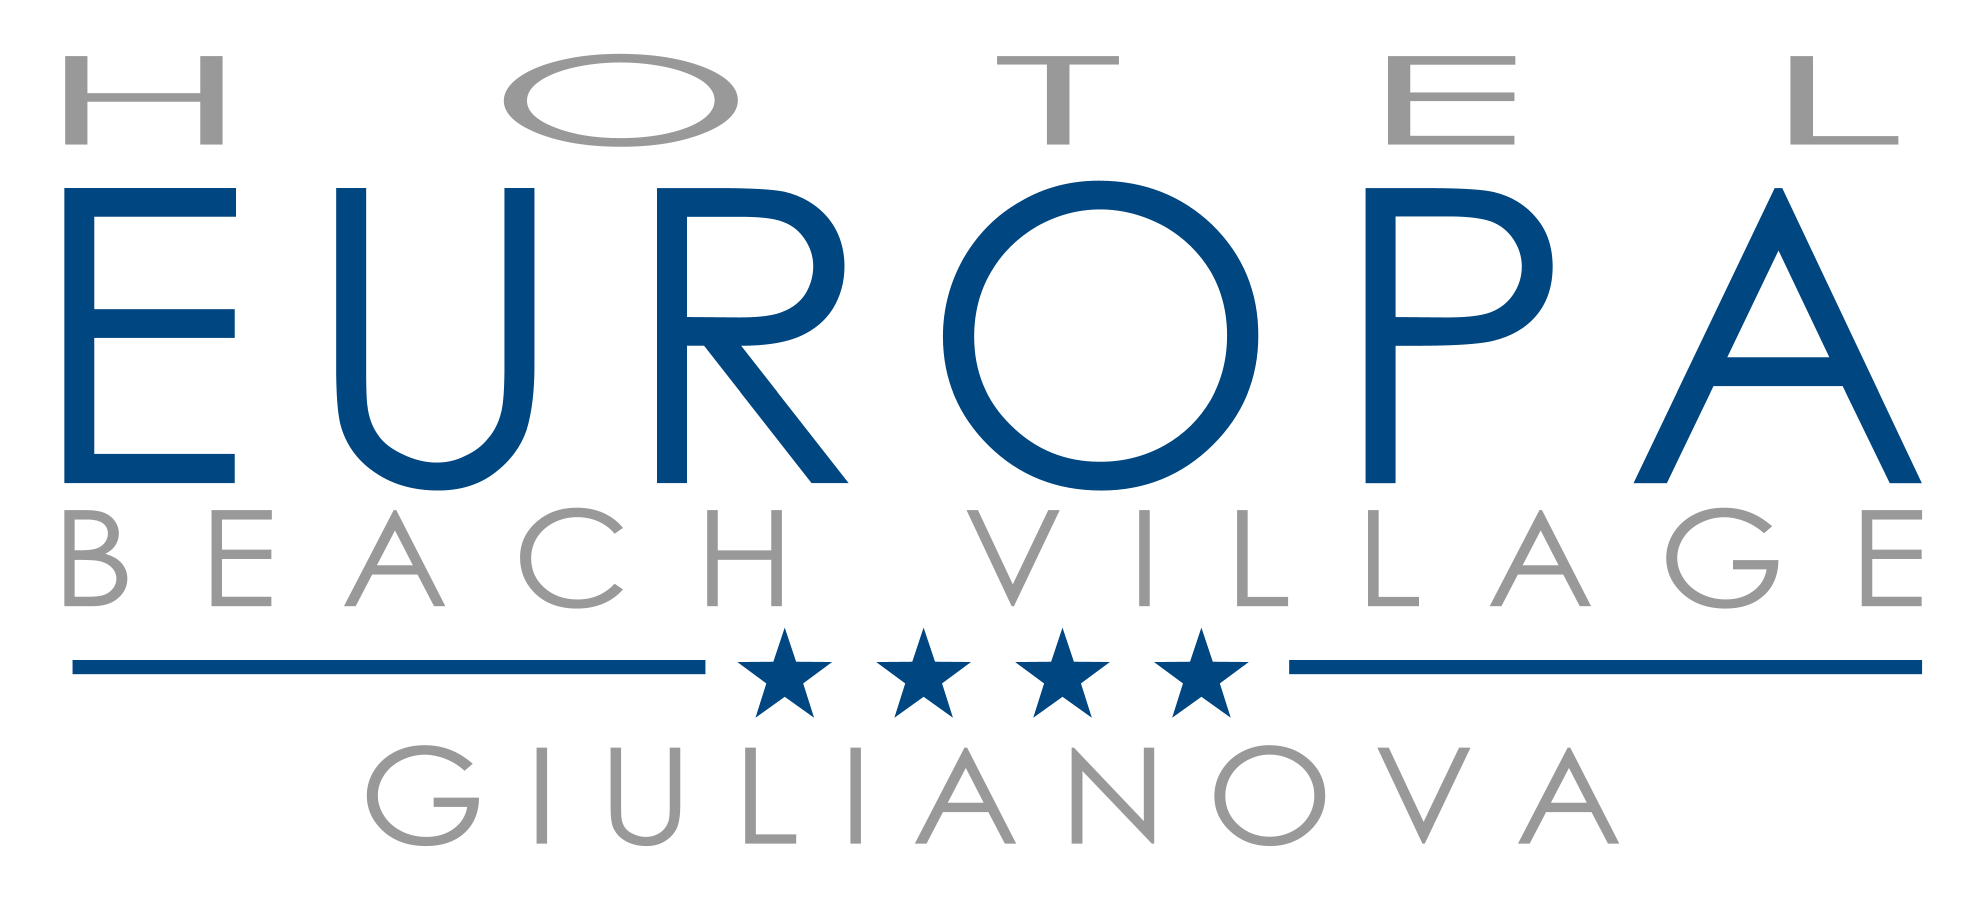 logo hotel Hotel Europa Beach Village giulianova